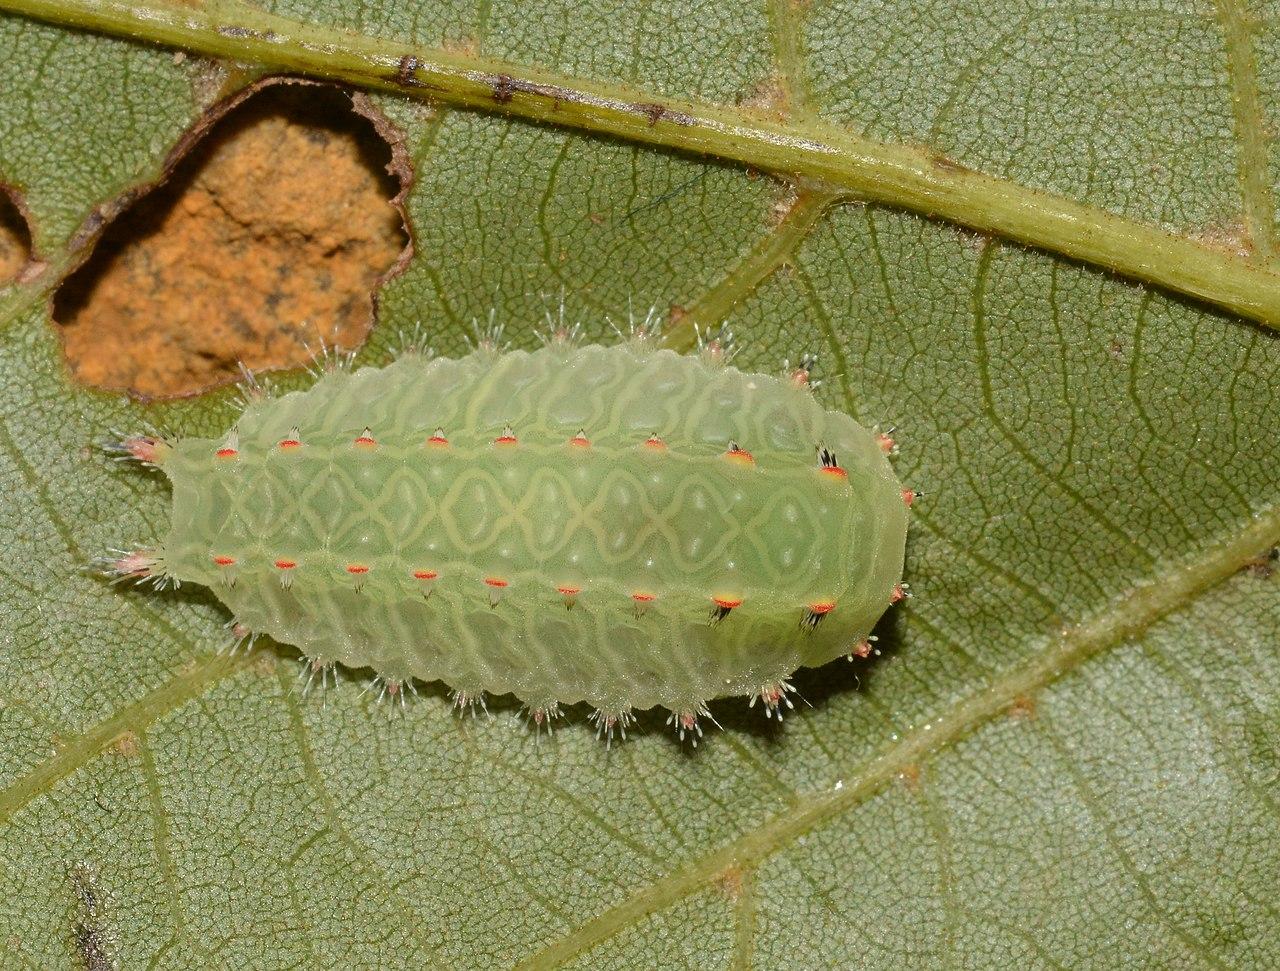 File:- 4679 – Natada nasoni – Nason's Slug Moth caterpillar (30872116748).jpg - Wikimedia Commons